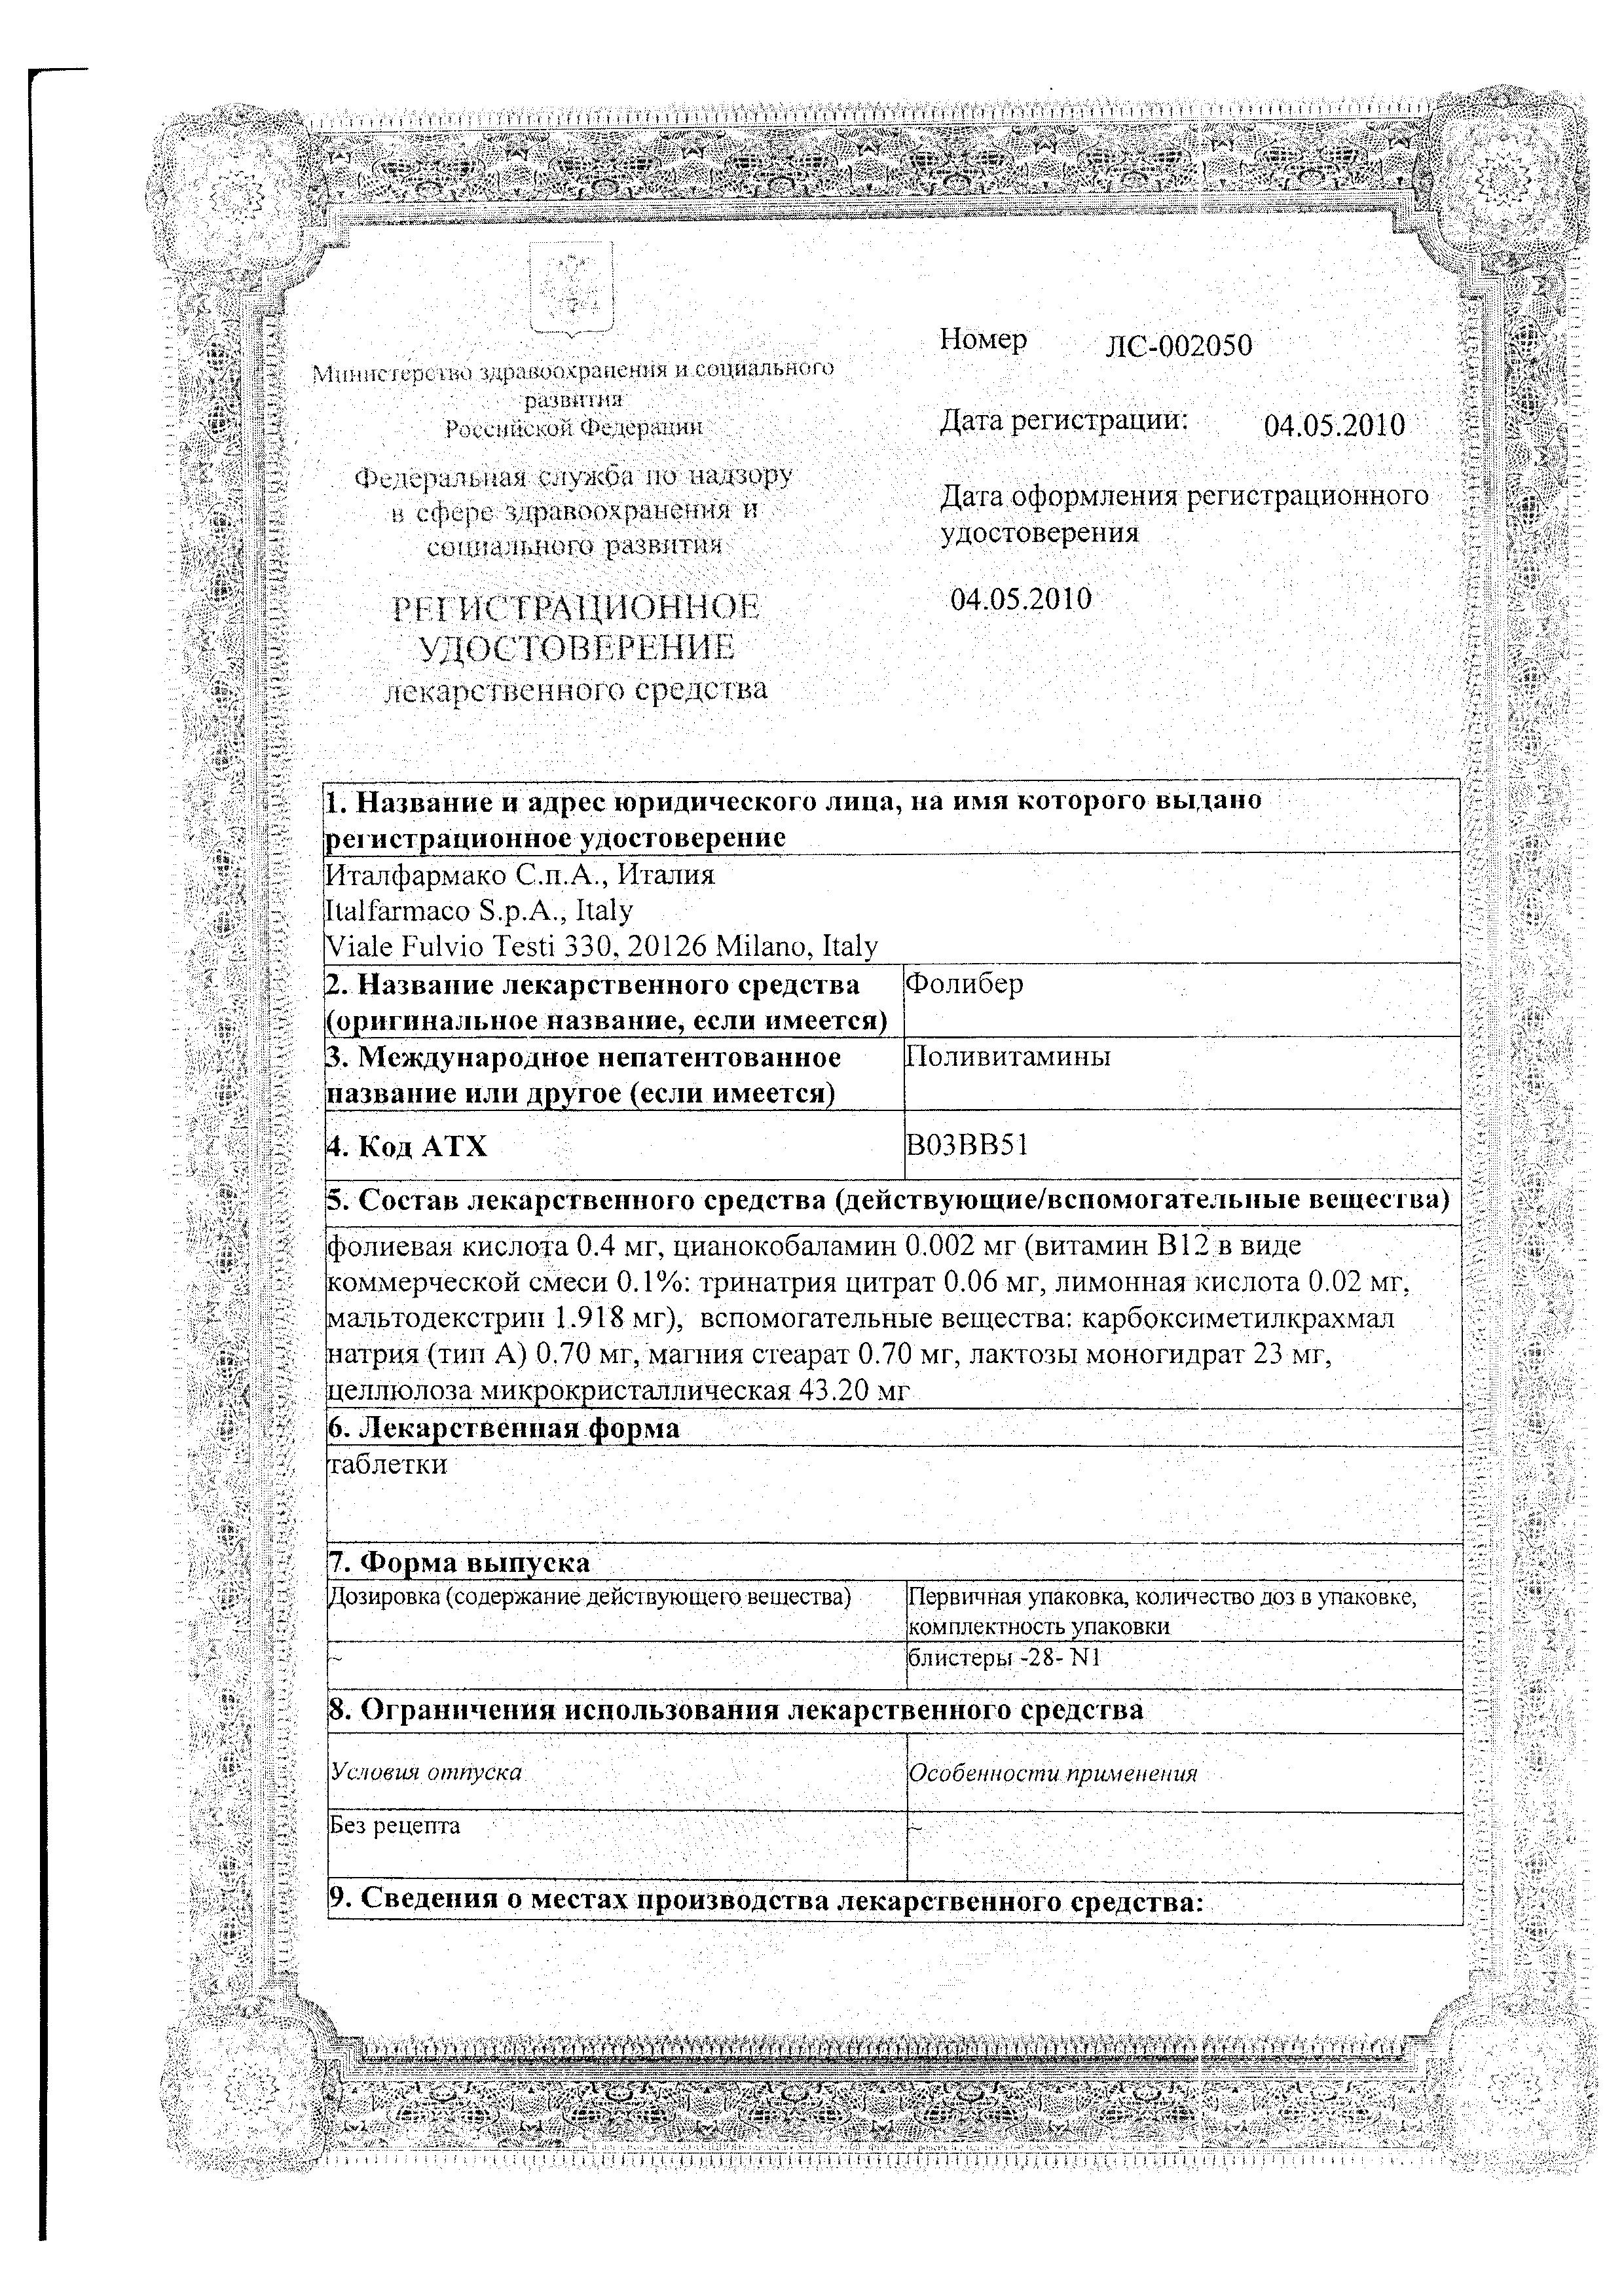 Фолибер сертификат